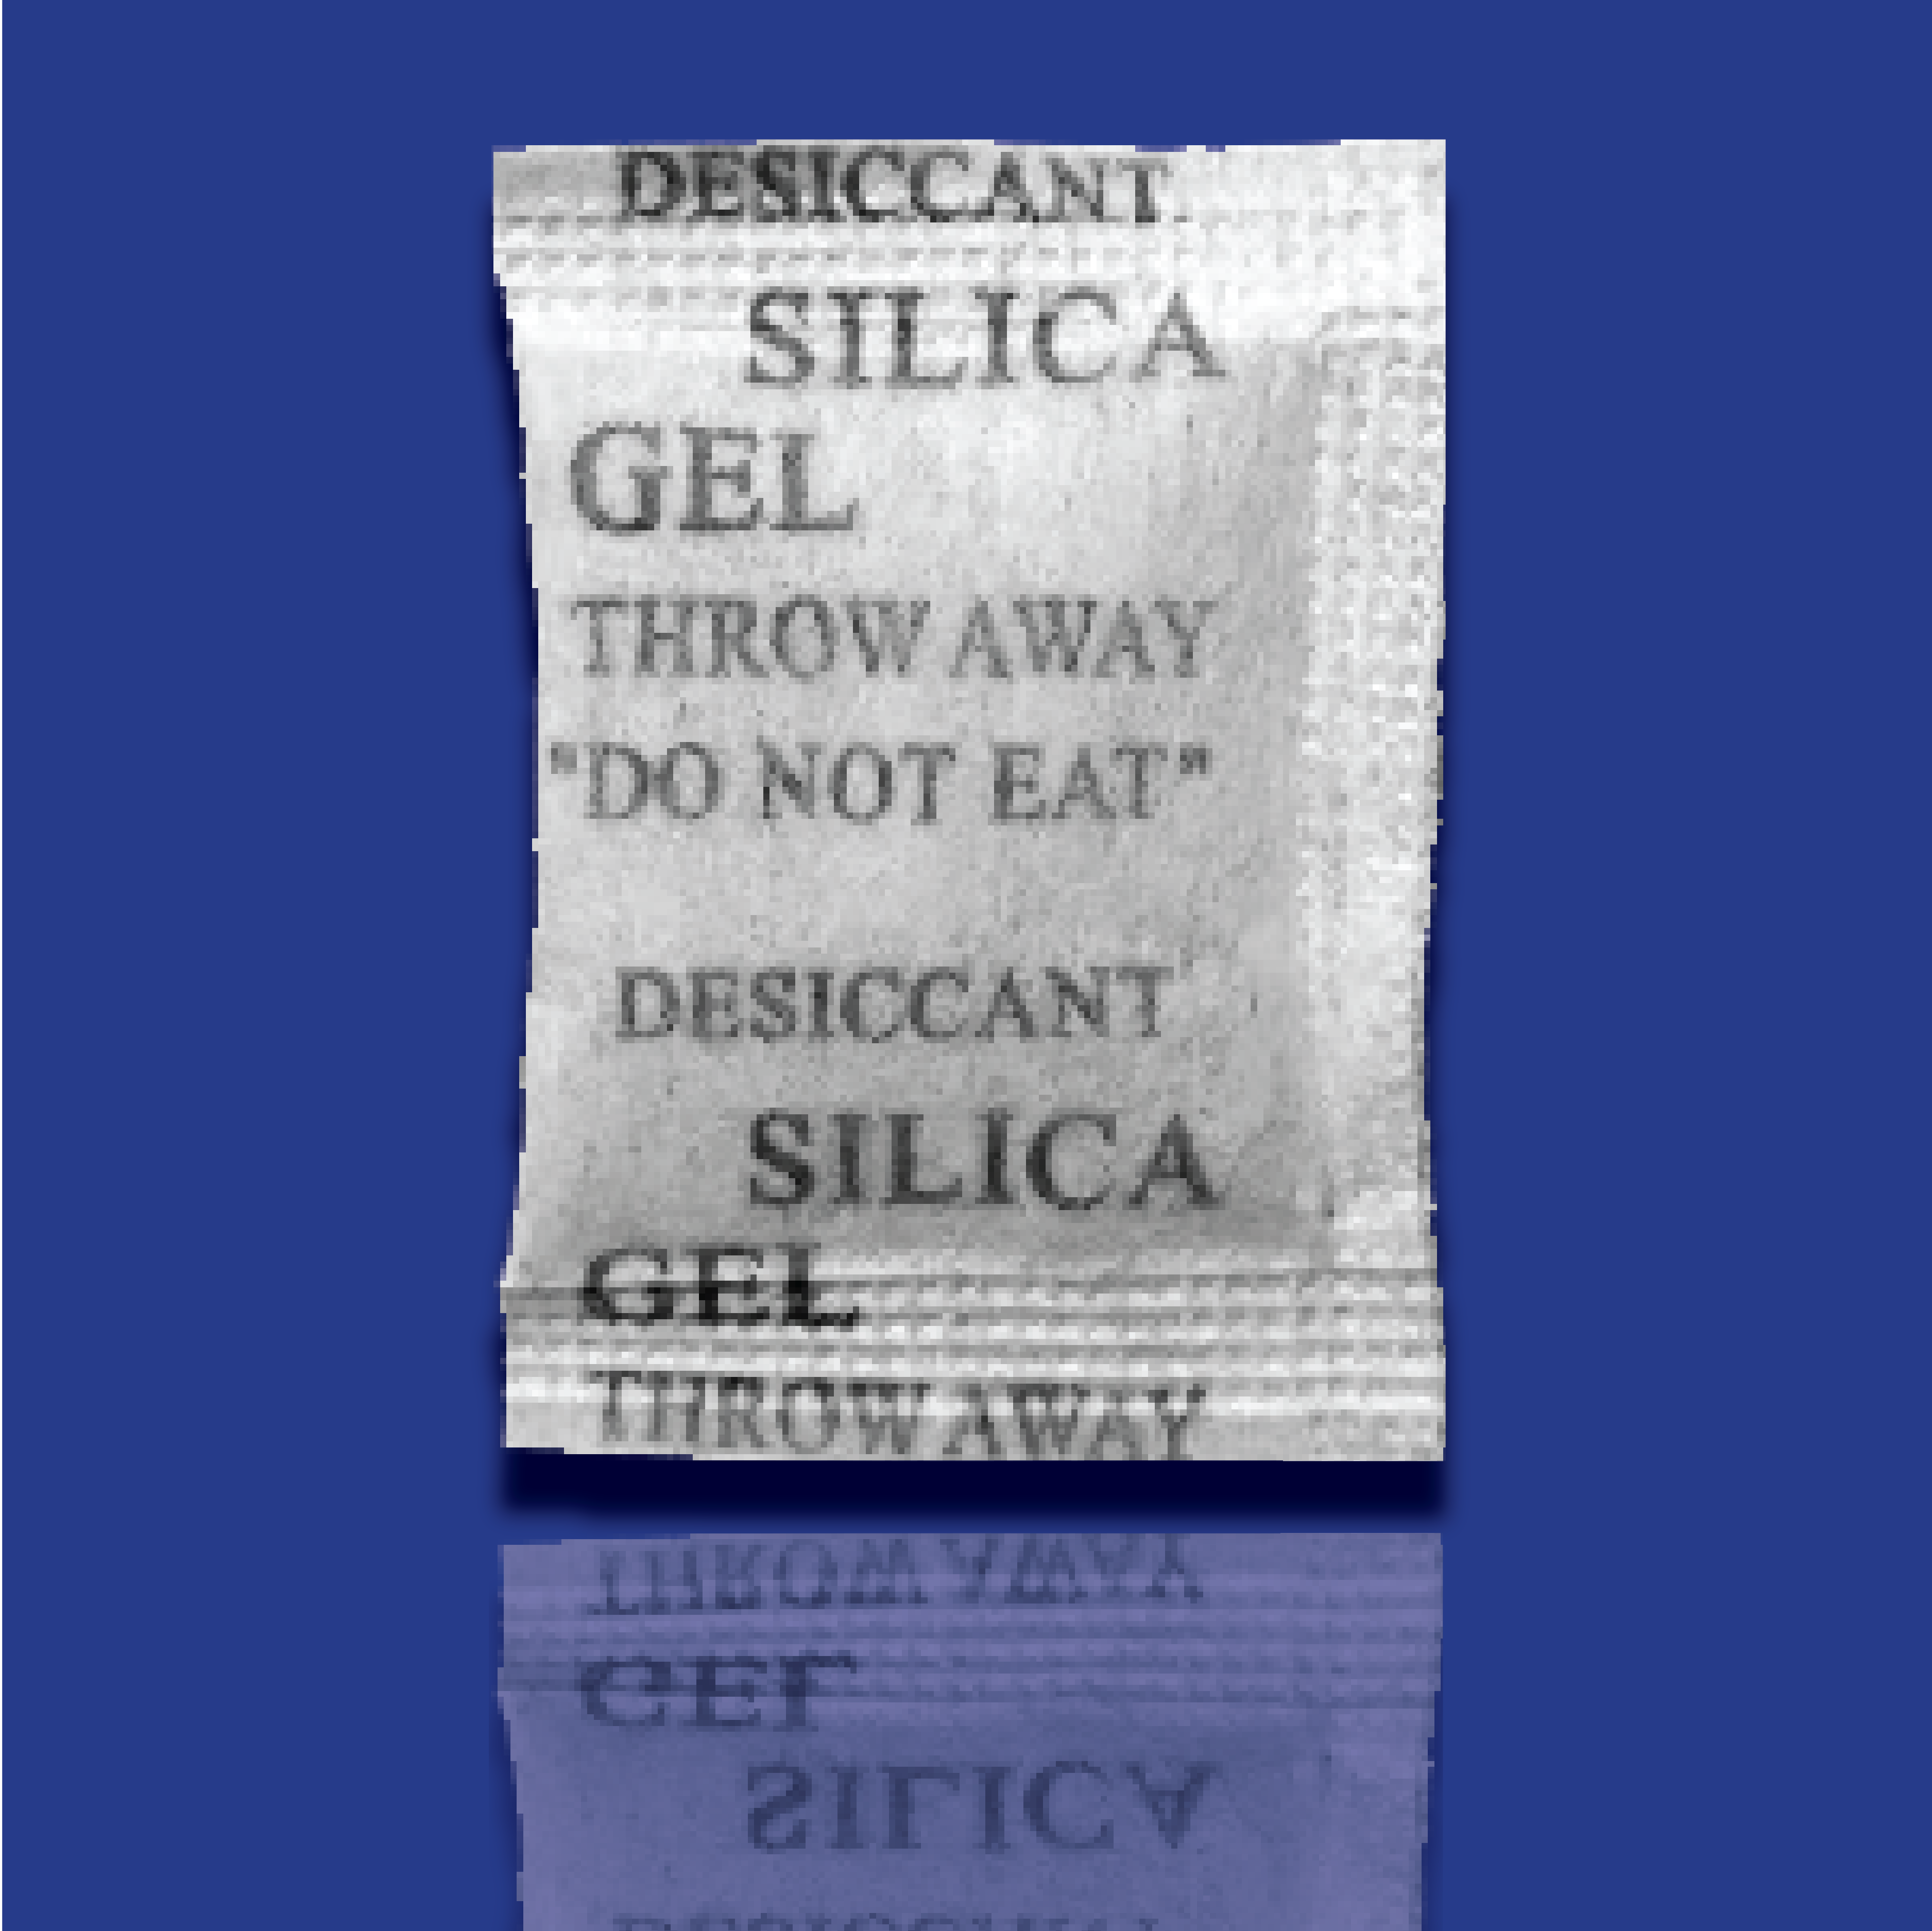 Gói hút ẩm Silica Gel 2 Gram